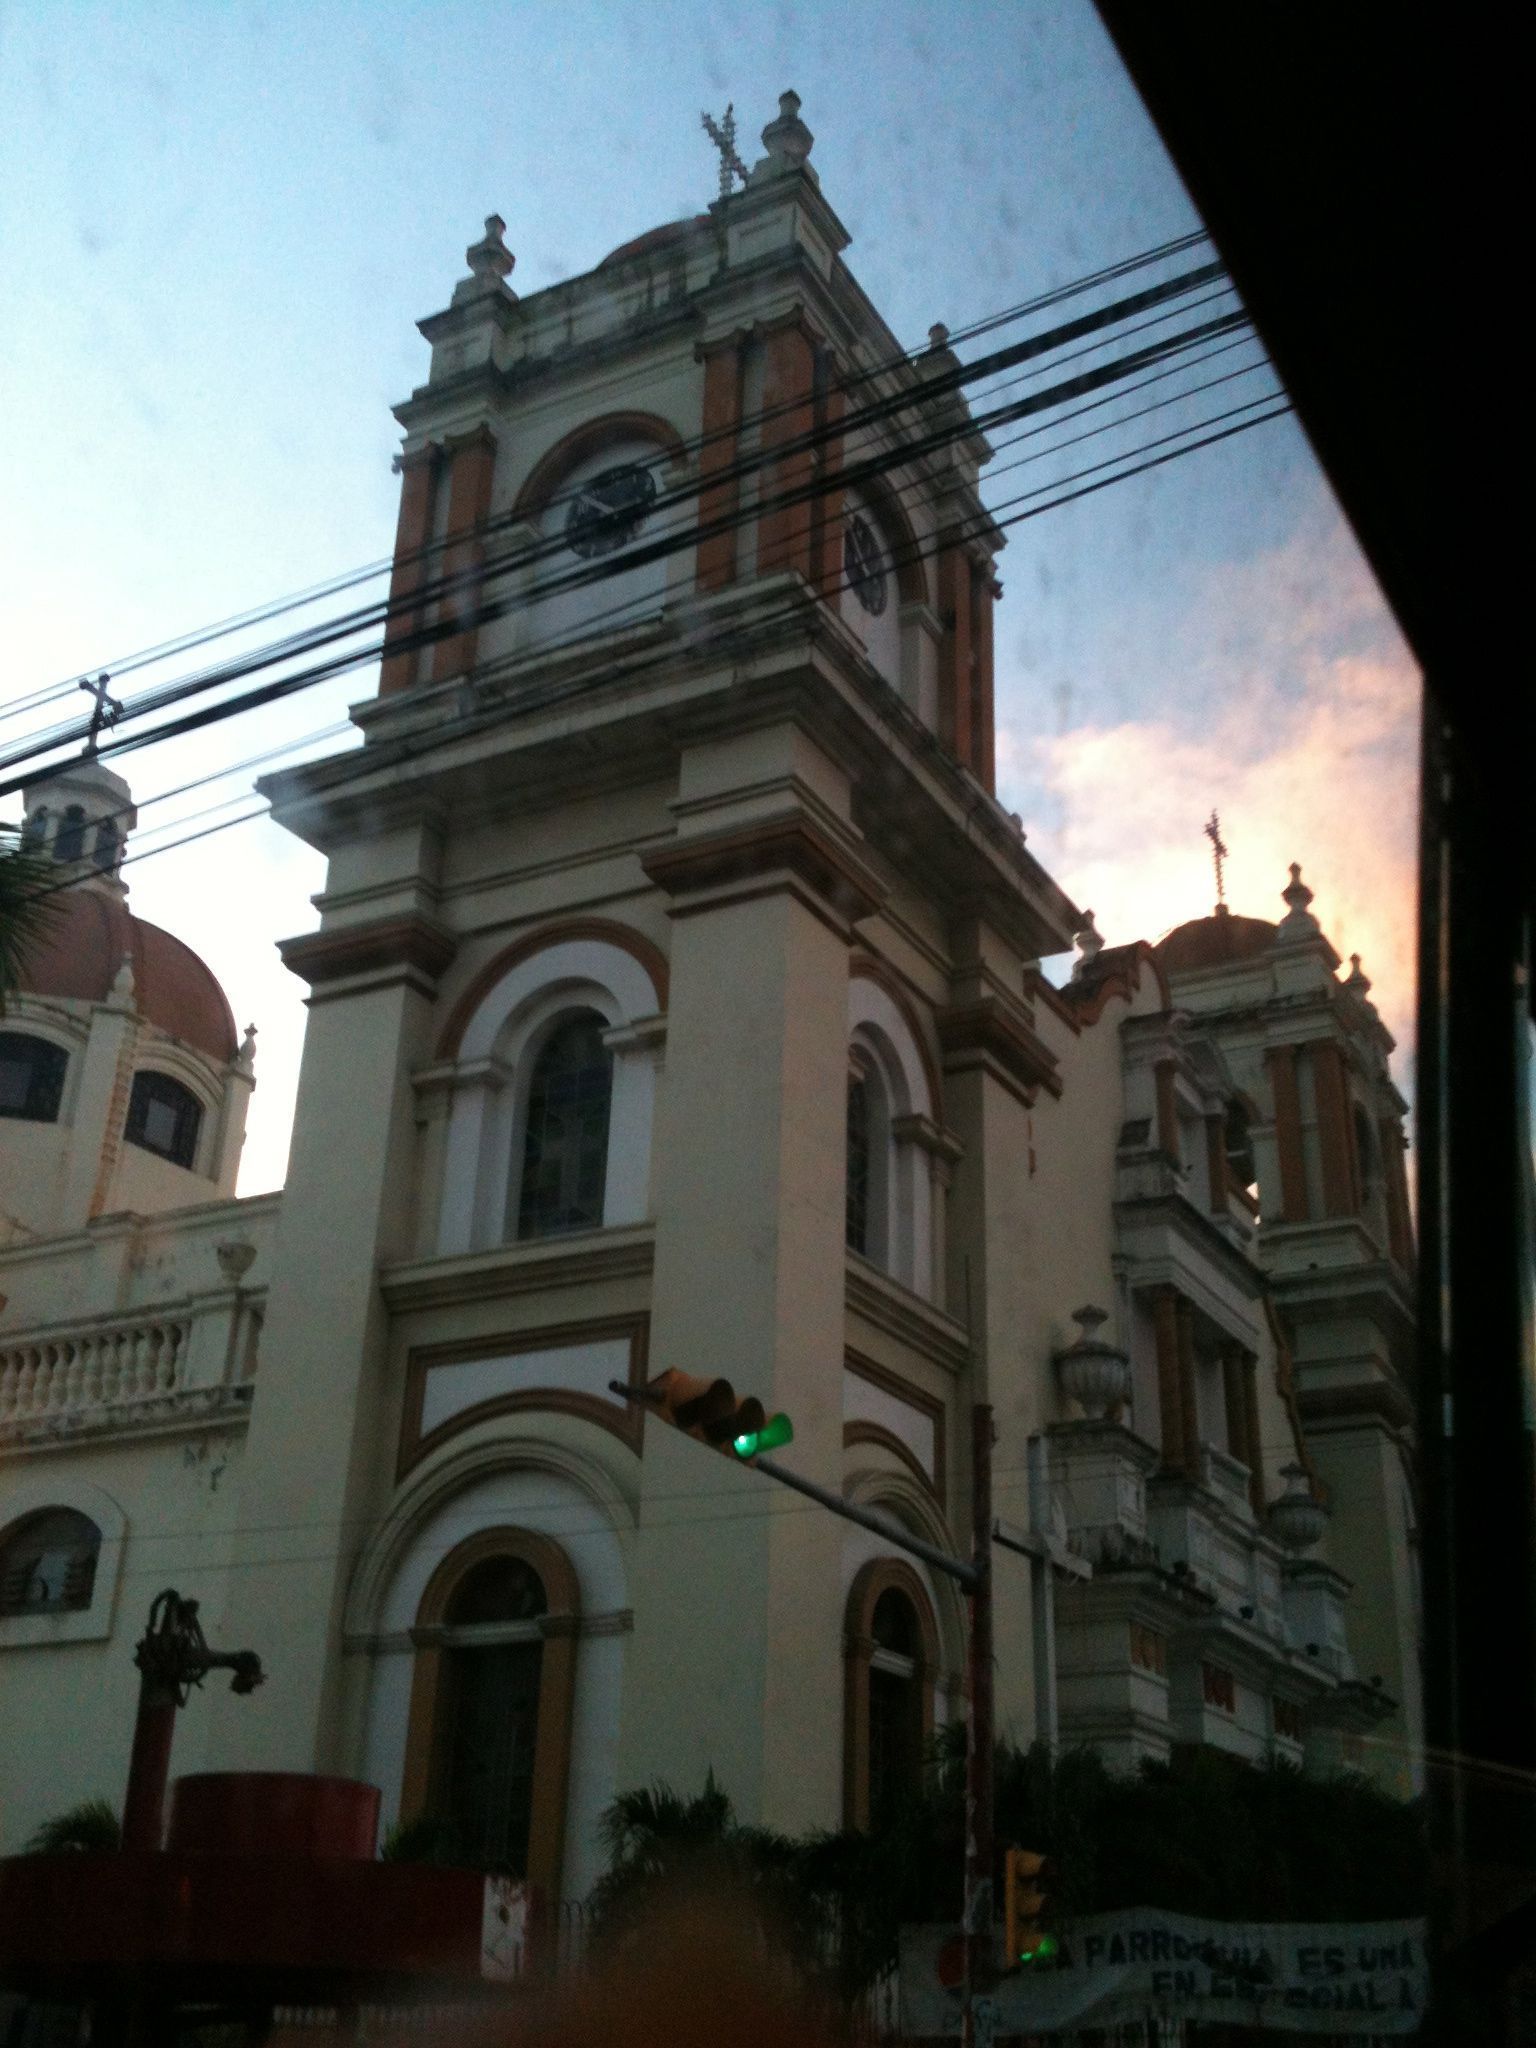 San Pedro Sula #sanpedrosula San Pedro Sula #sanpedrosula San Pedro Sula #sanpedrosula San Pedro Sula #sanpedrosula San Pedro Sula #sanpedrosula San Pedro Sula #sanpedrosula San Pedro Sula #sanpedrosula San Pedro Sula #sanpedrosula